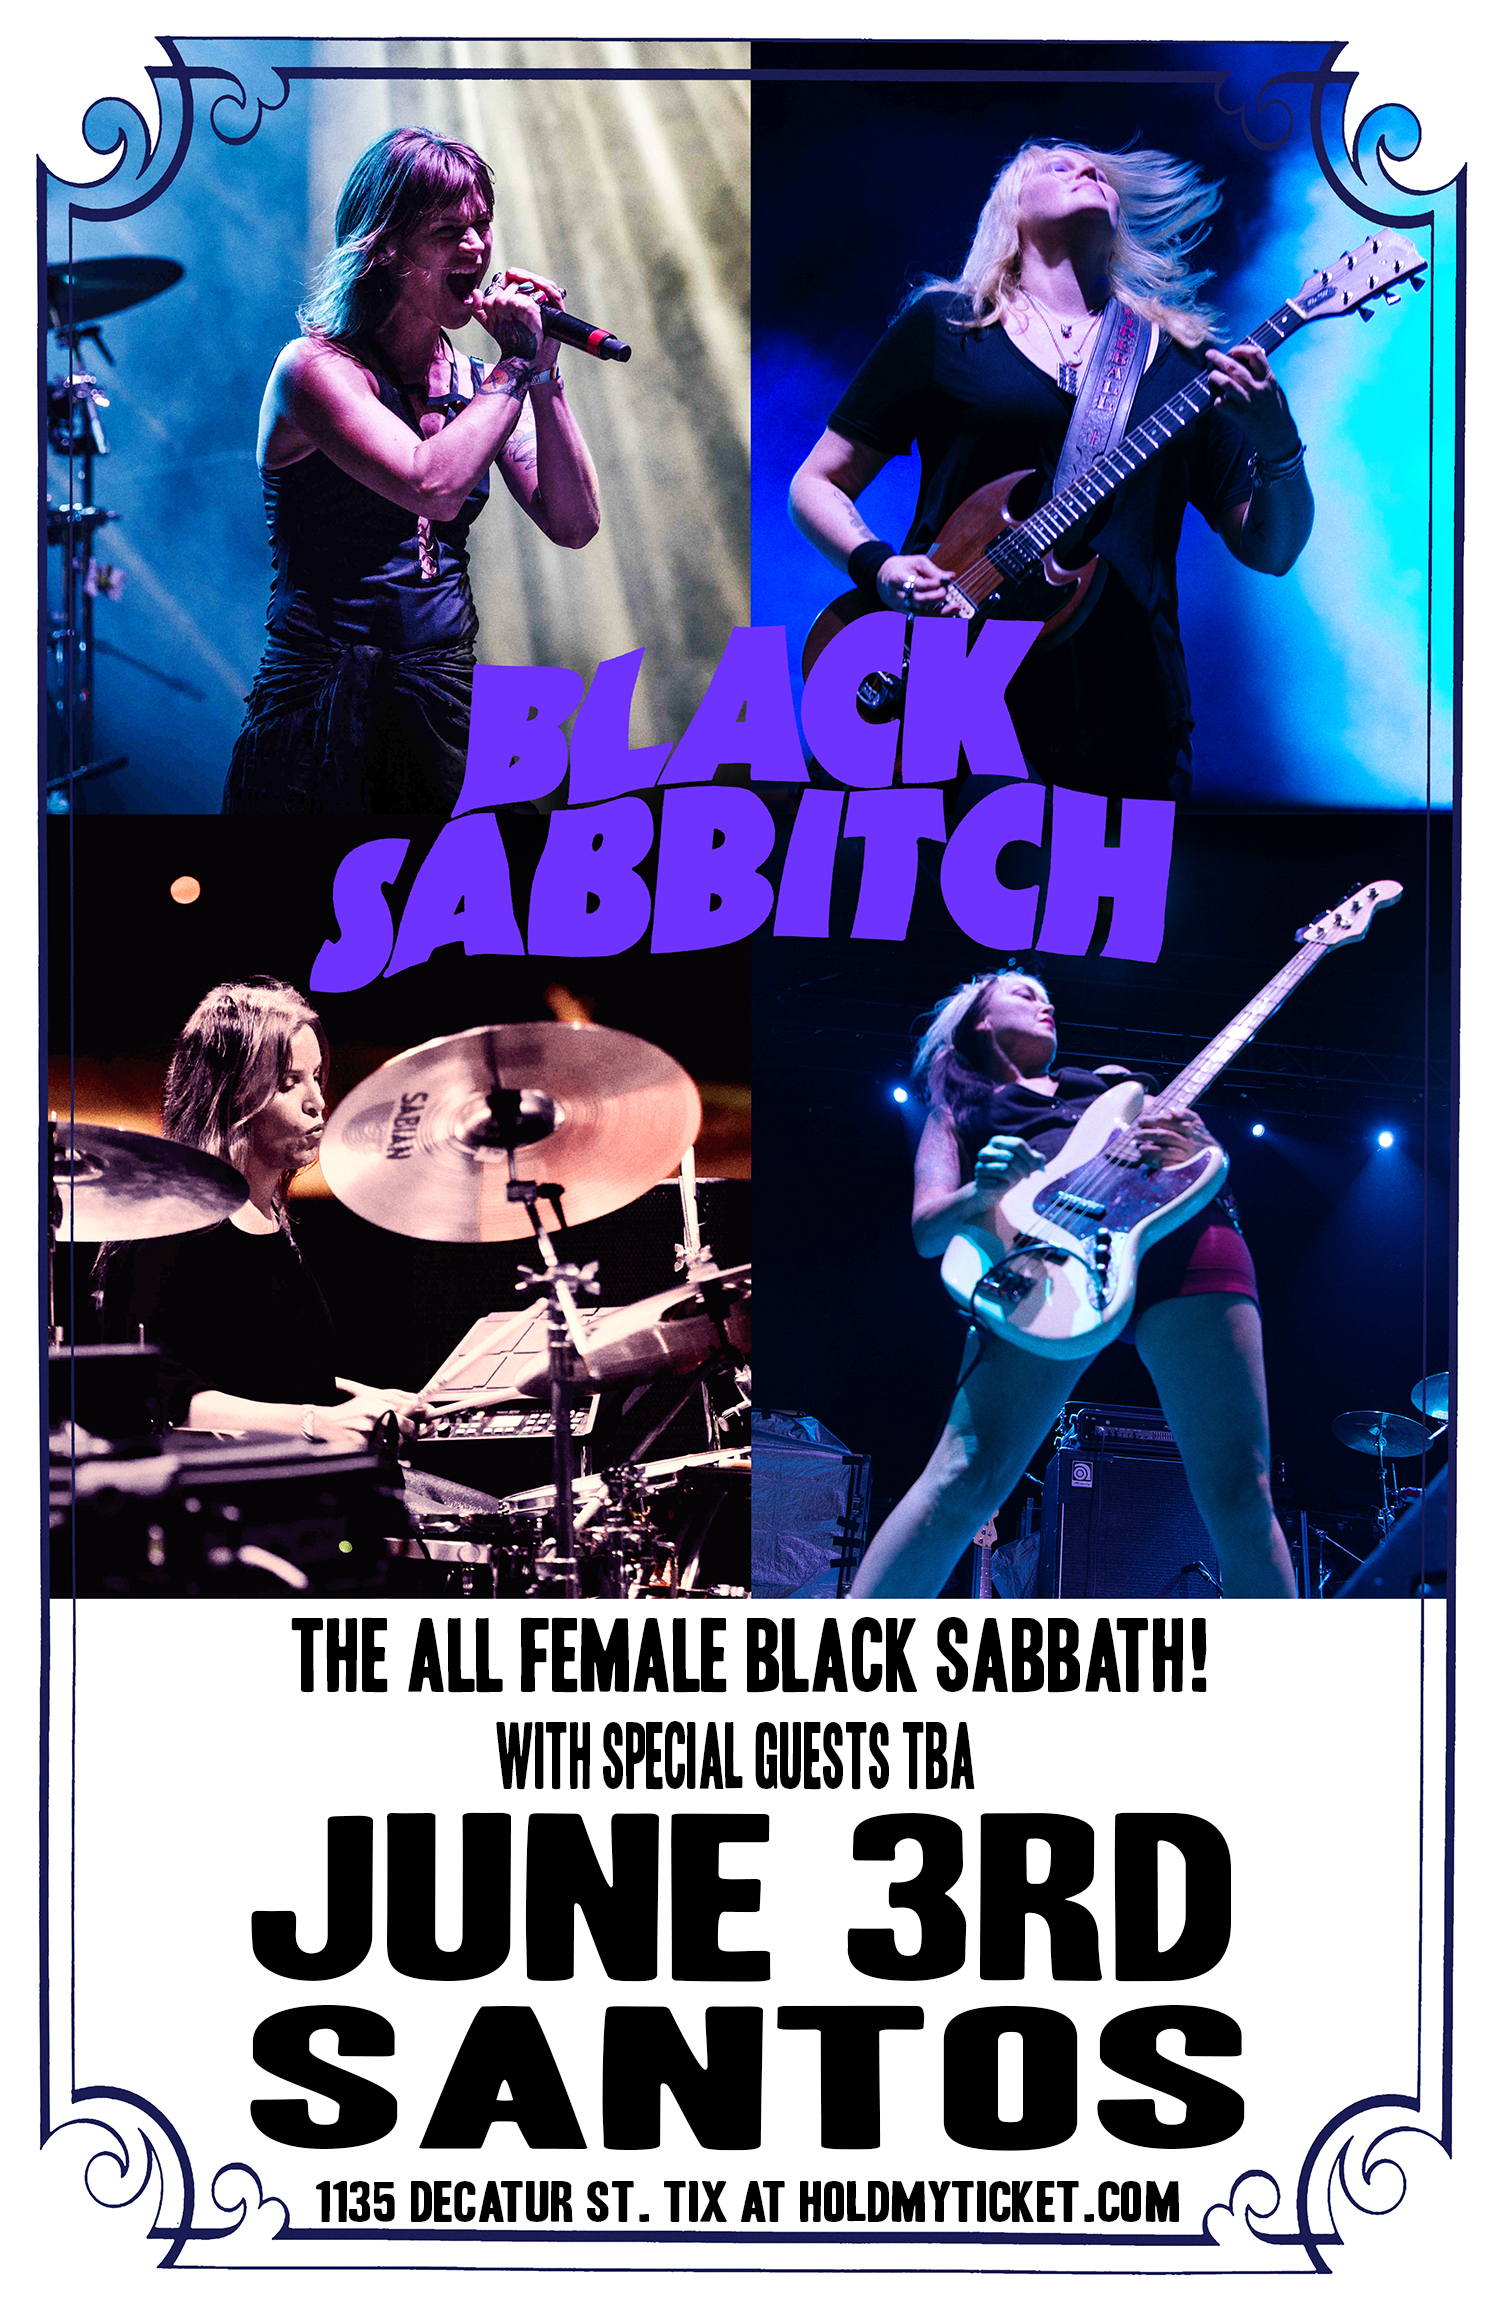 black sabbitch posgter.jpg